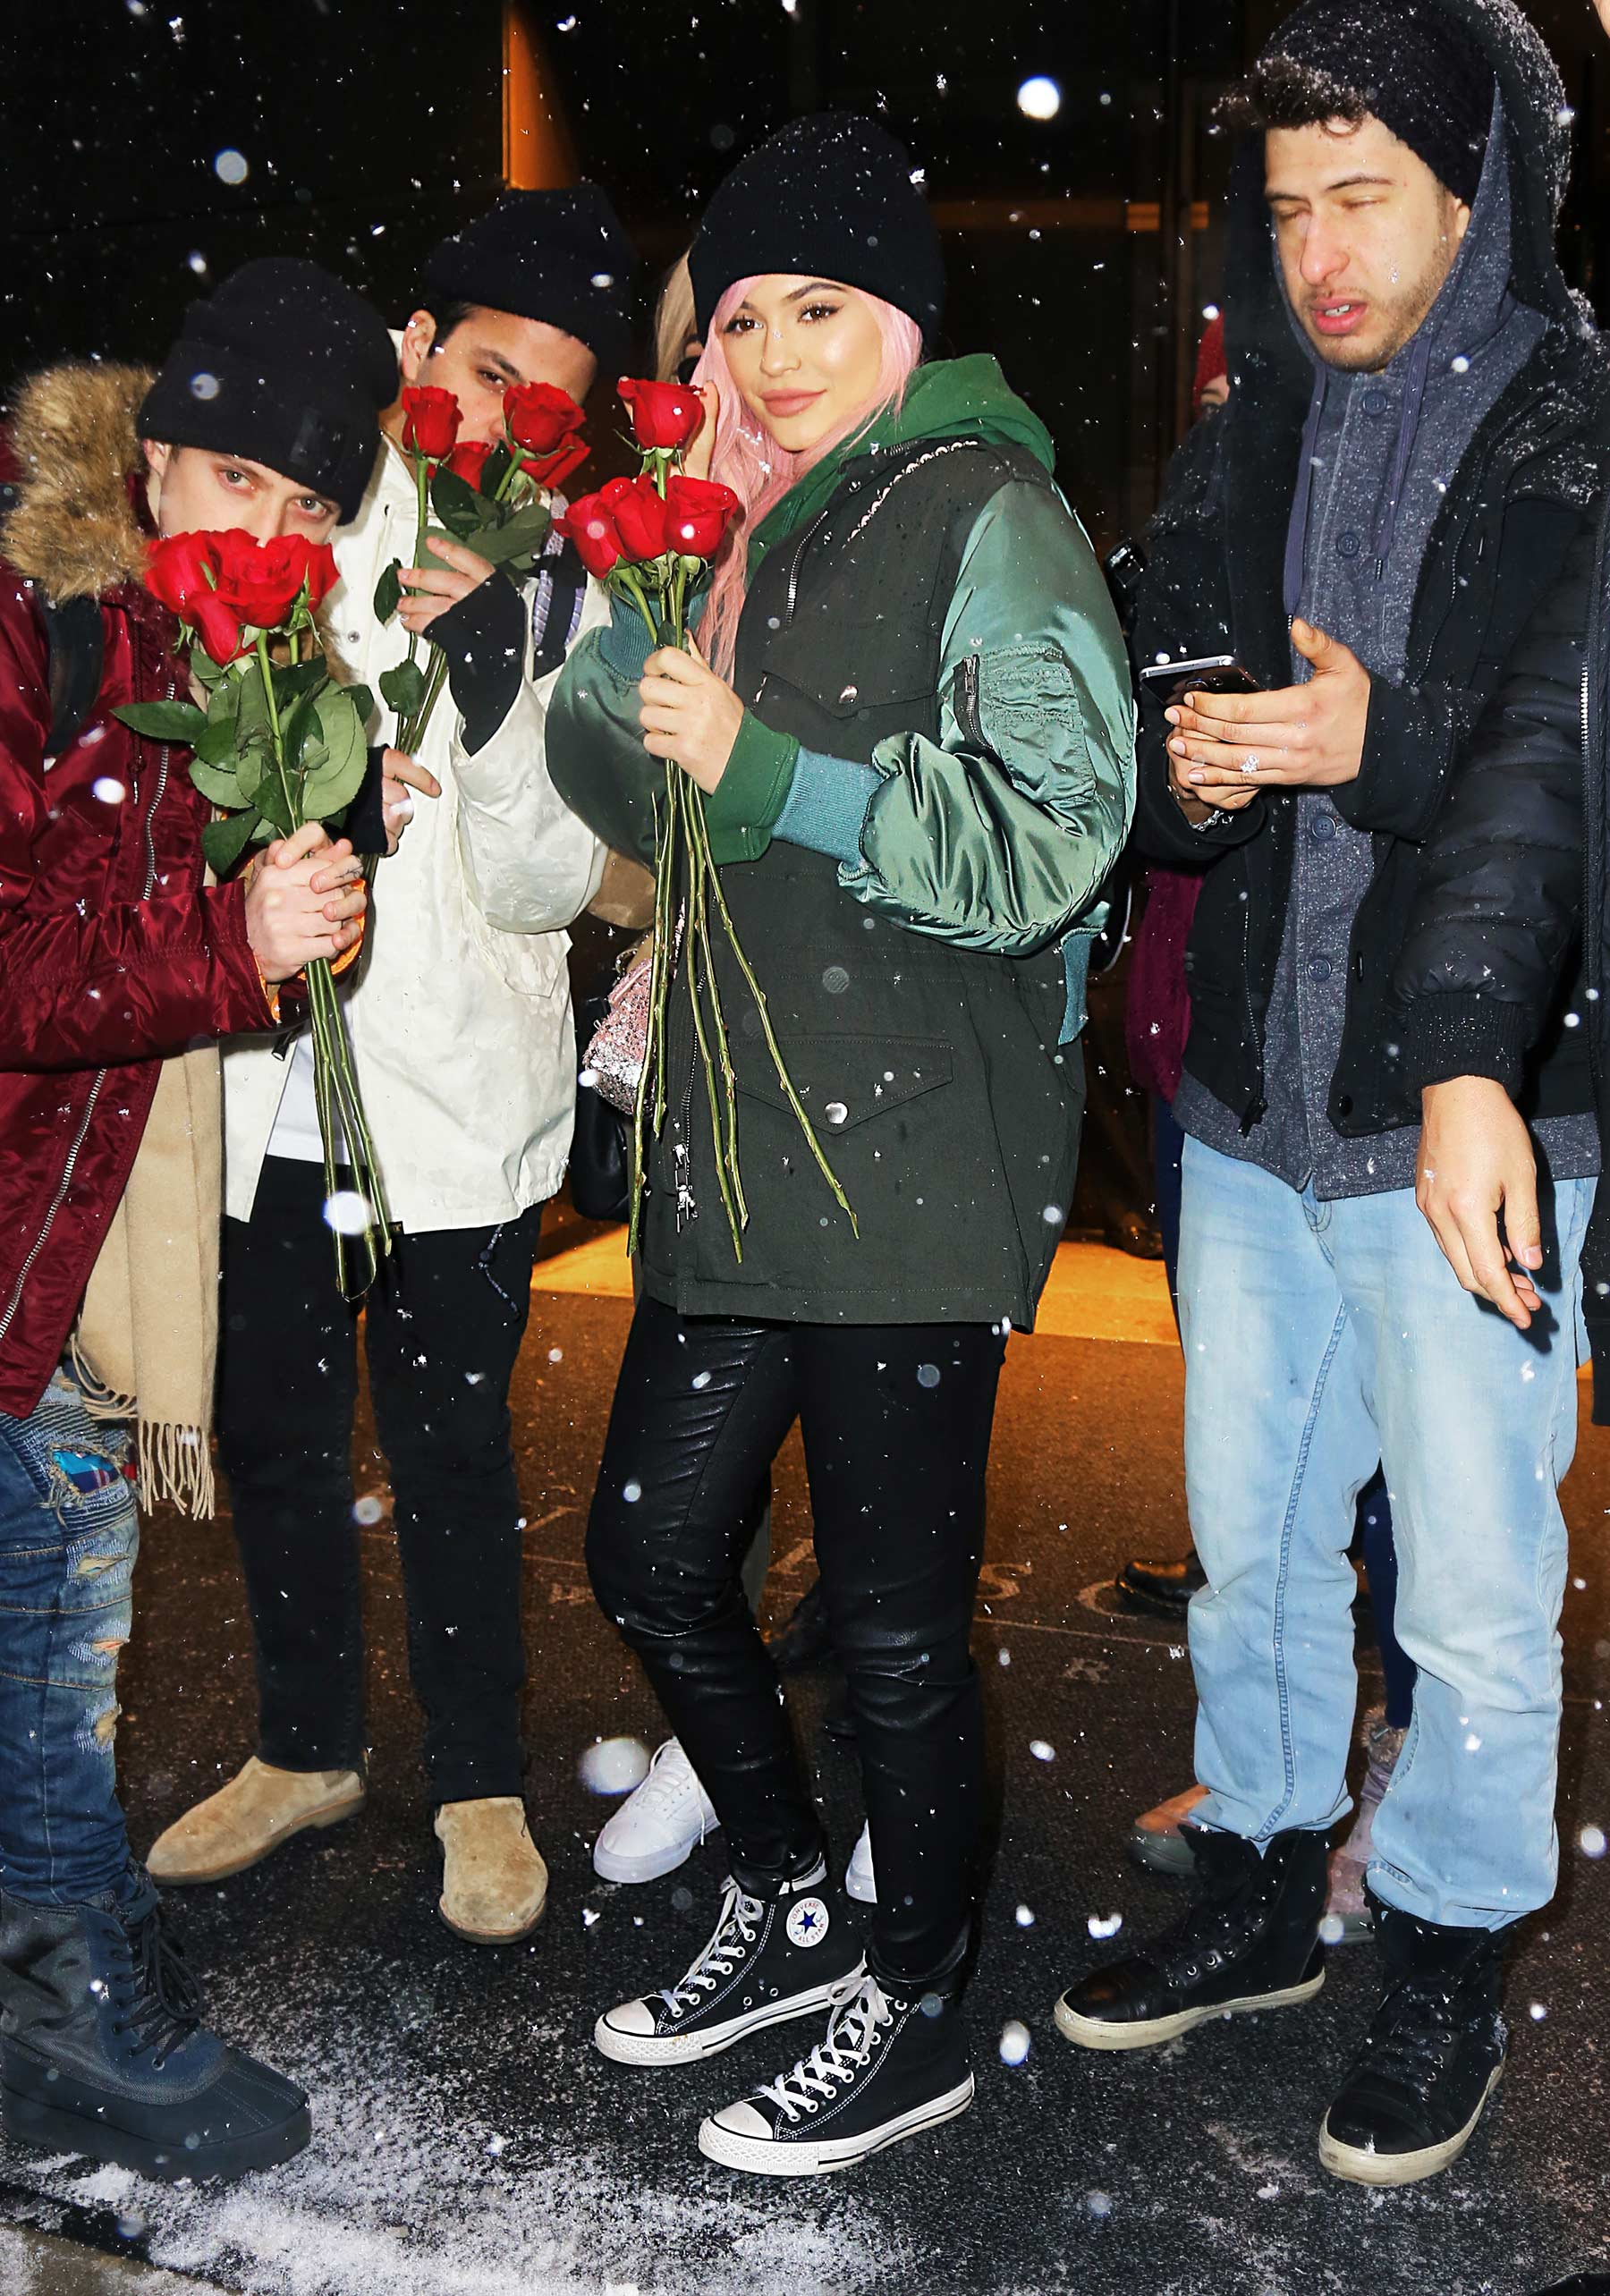 Kylie Jenner leaving her hotel in New York City